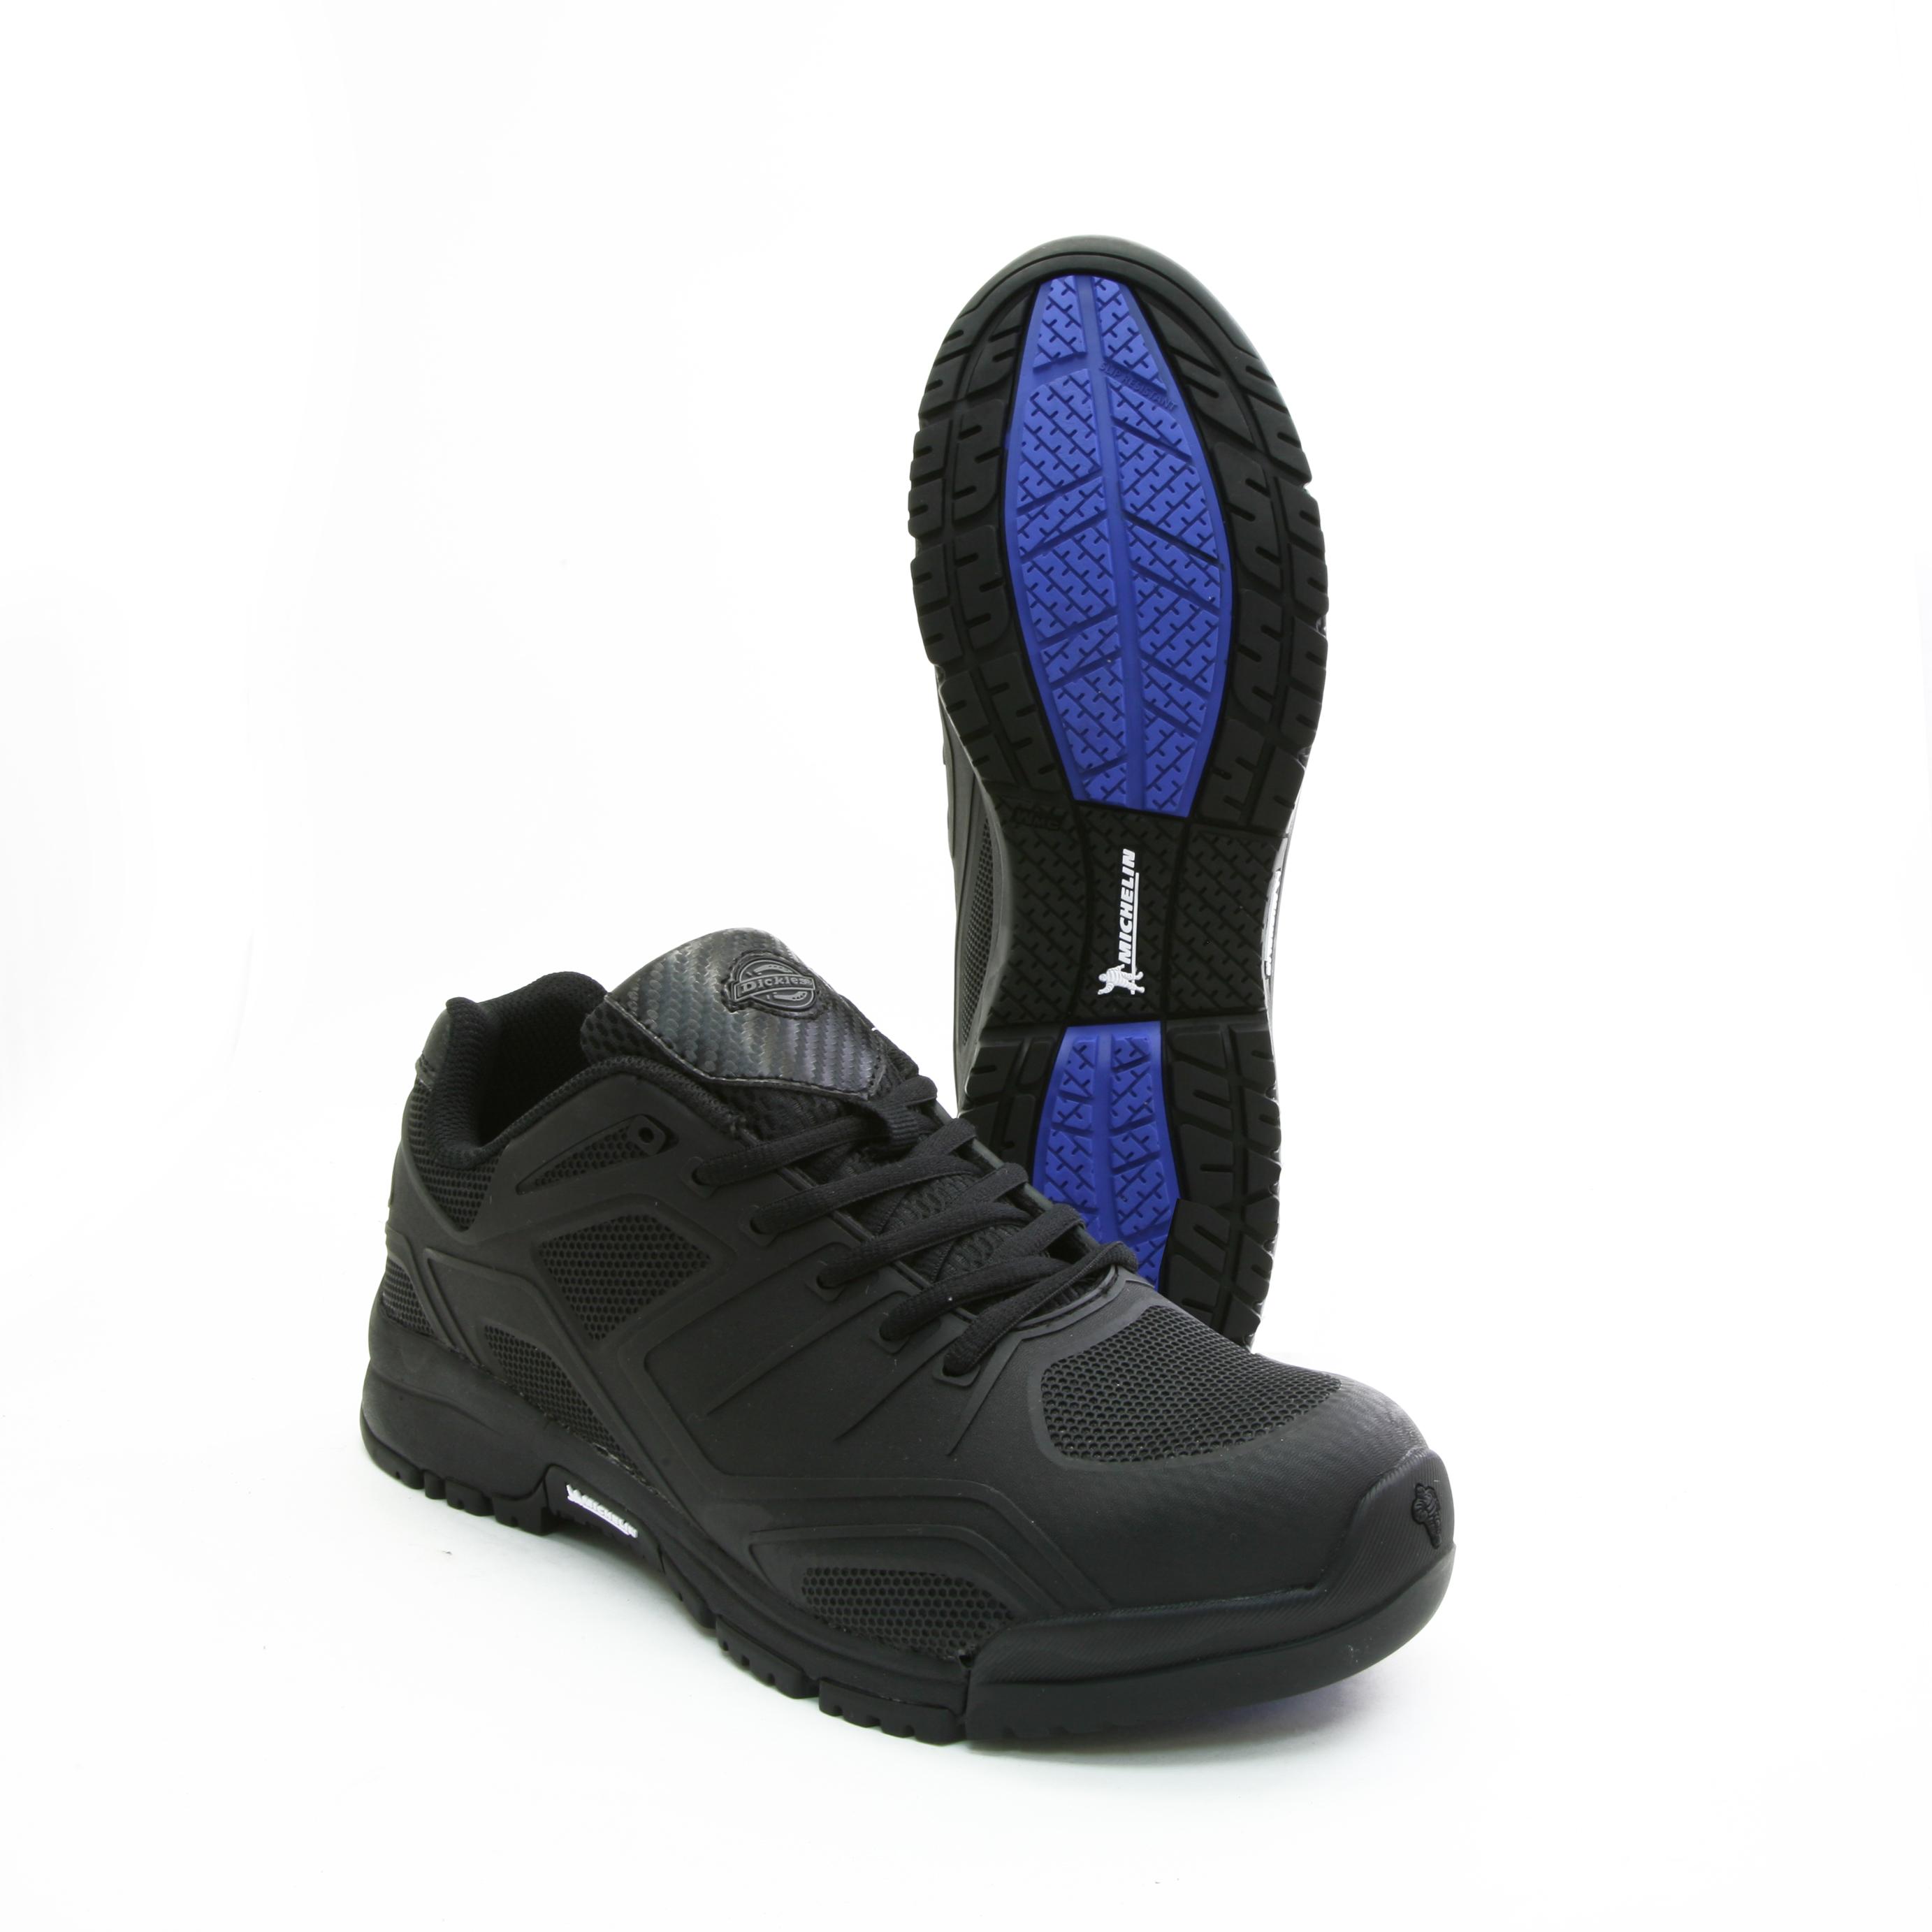 Dickies Spectre Men S Steel Toe Work Shoes